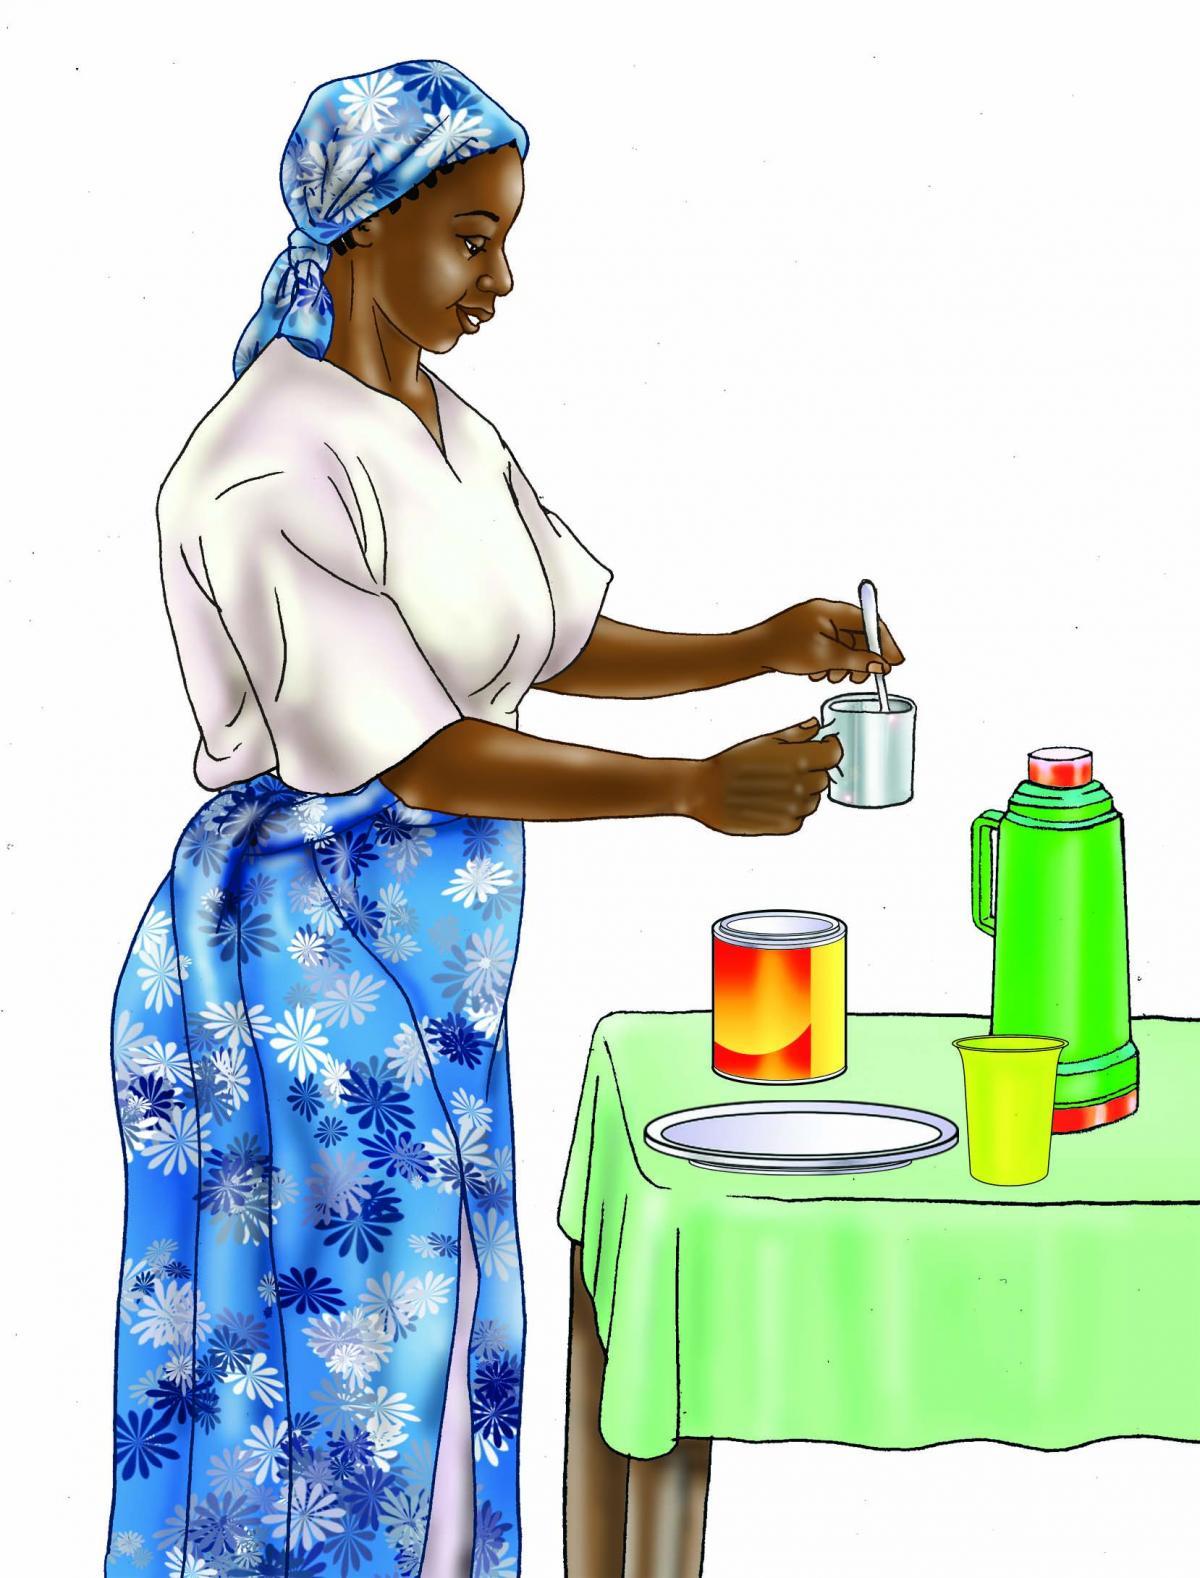 HIV - Preparing infant formula 0-24 mo - 04 - Tanzania